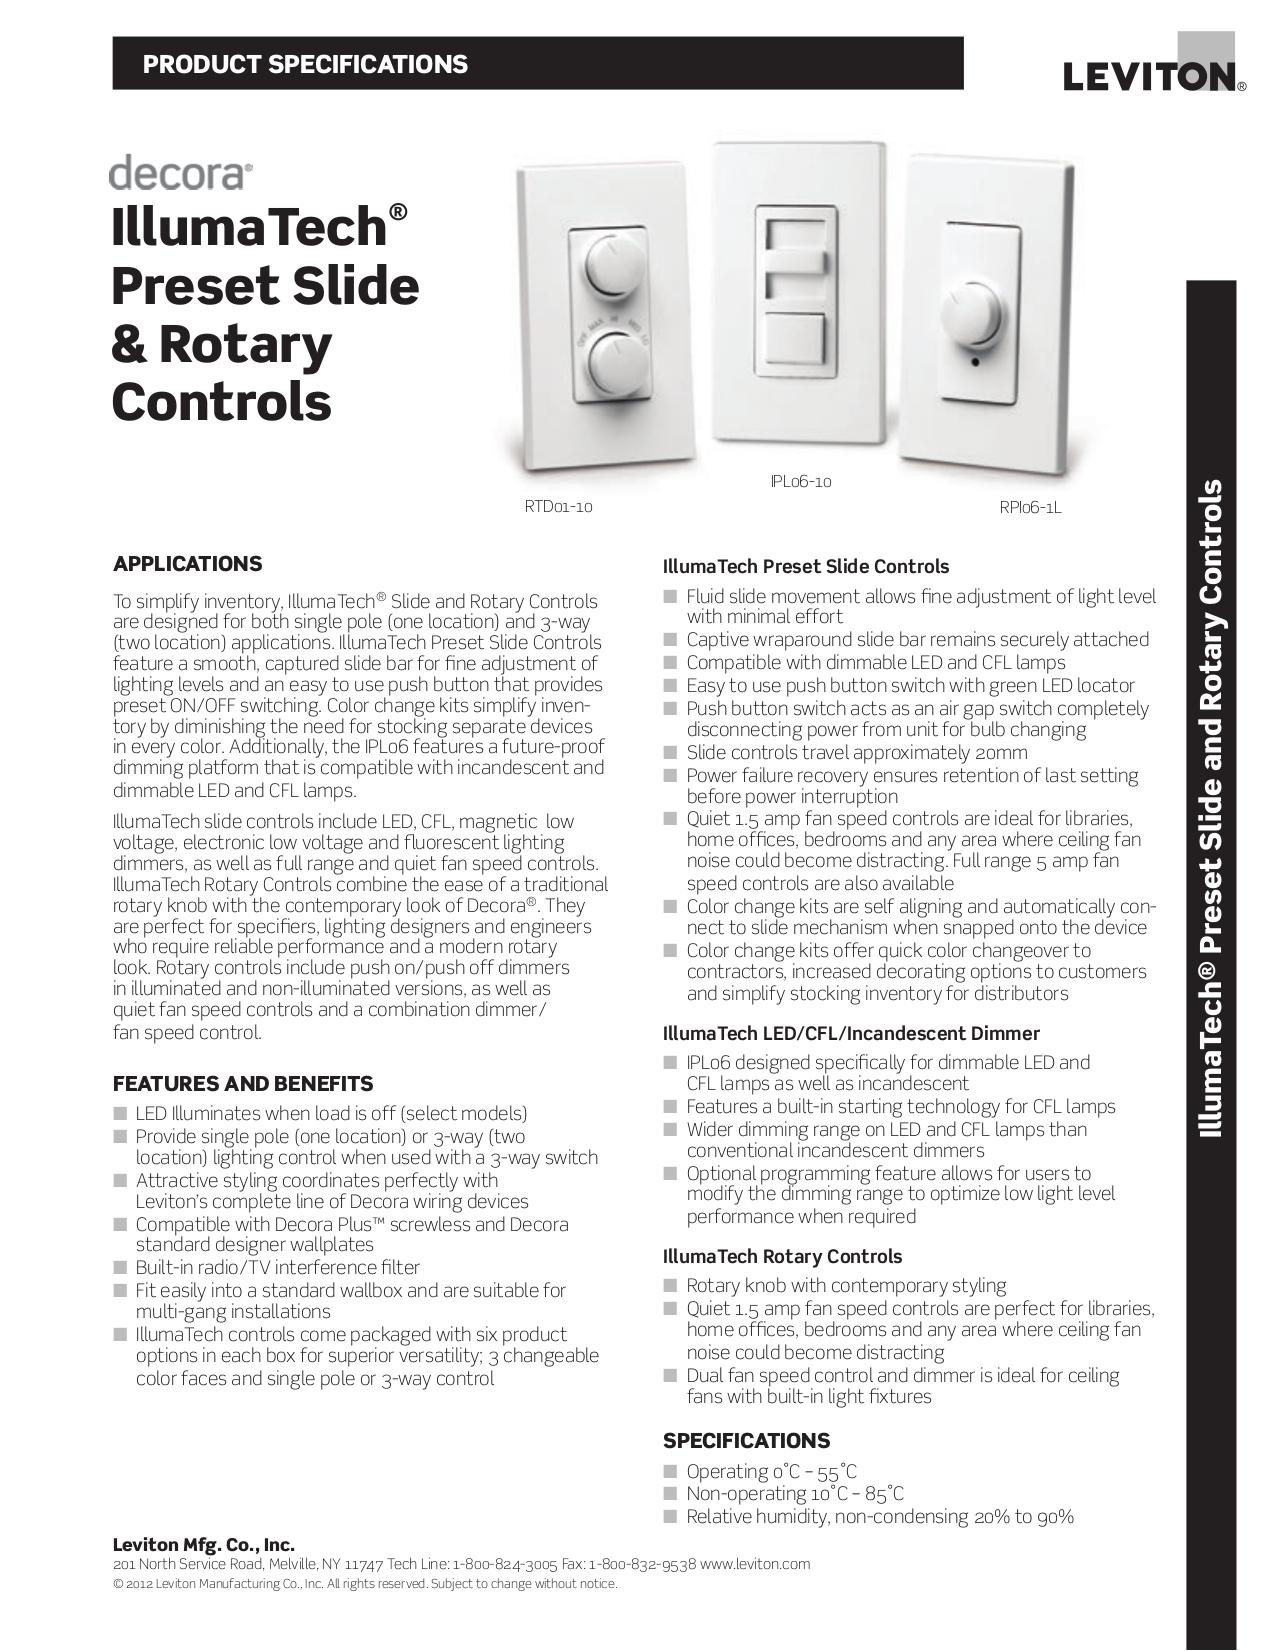 pdf for Leviton Other Illumatech IPI06-1L Dimmers manual